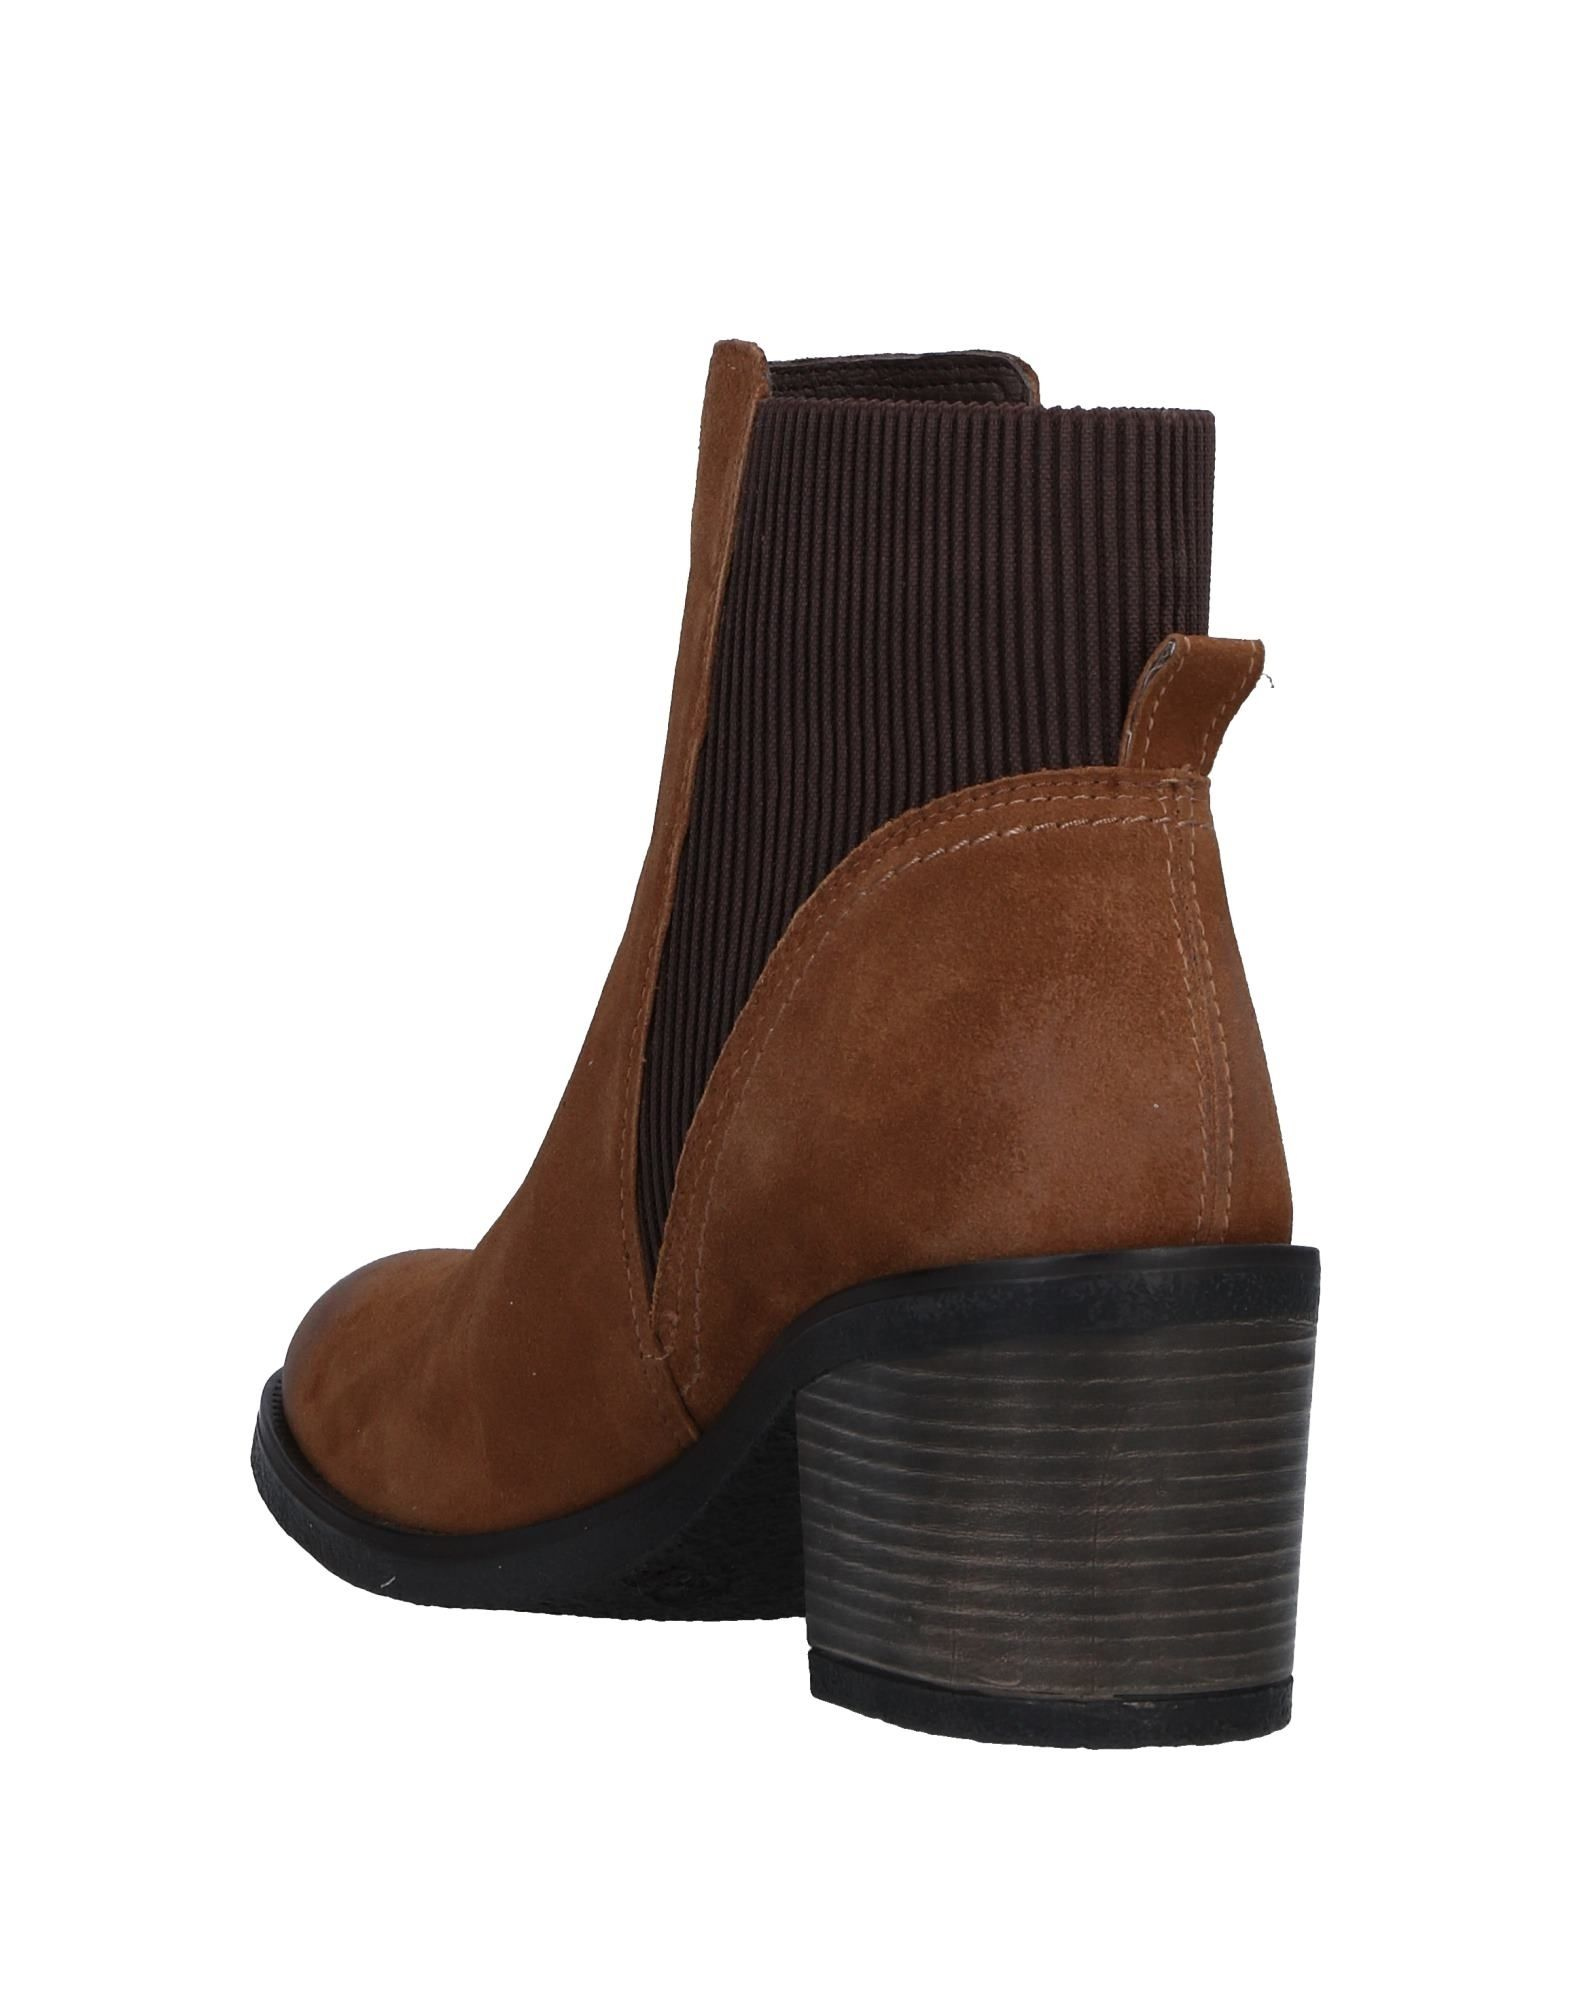 Gusto 11520392NU Stiefelette Damen  11520392NU Gusto Gute Qualität beliebte Schuhe fa5211